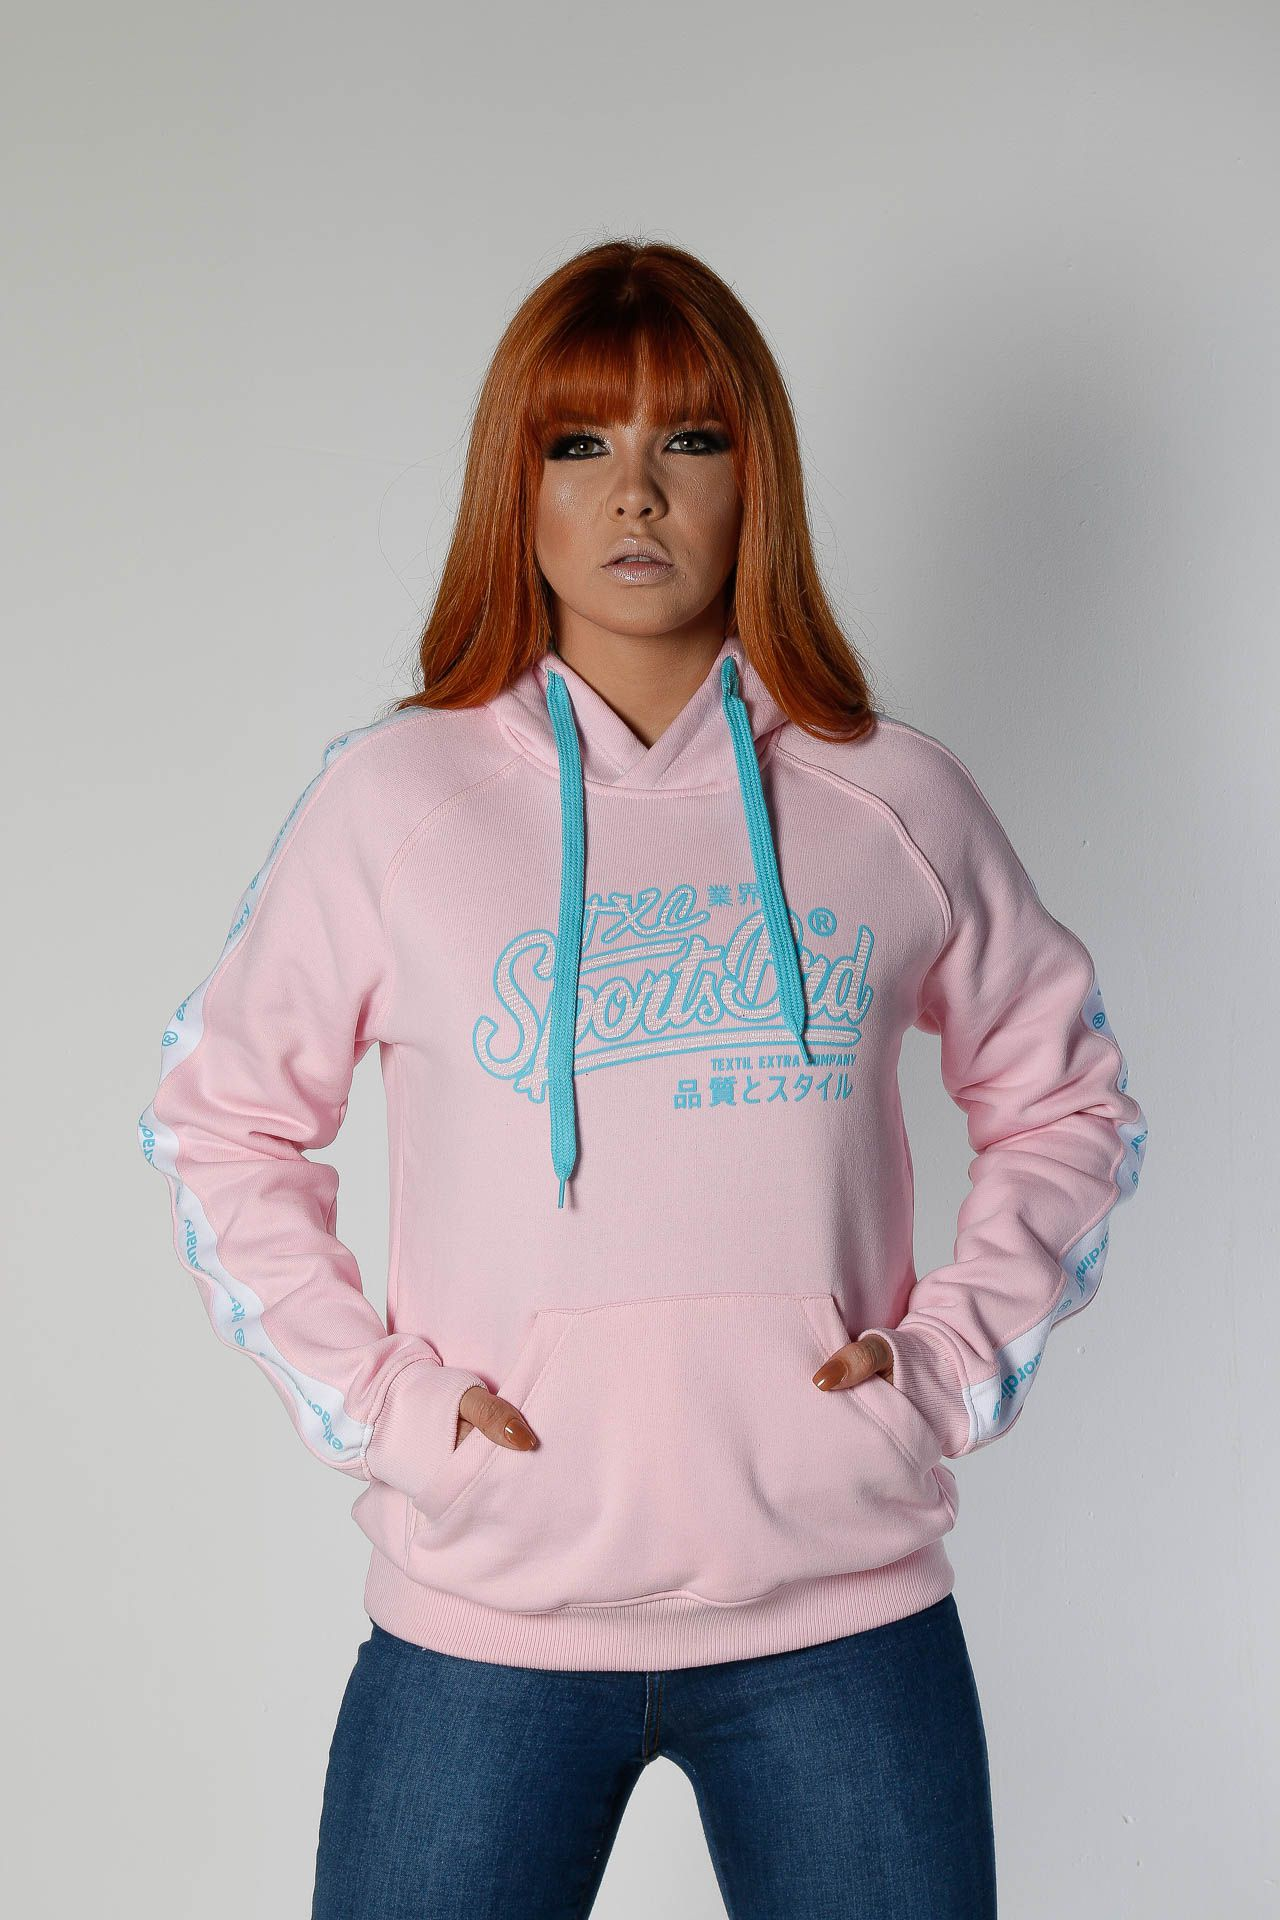 Moletom TXC Brand feminino 9040